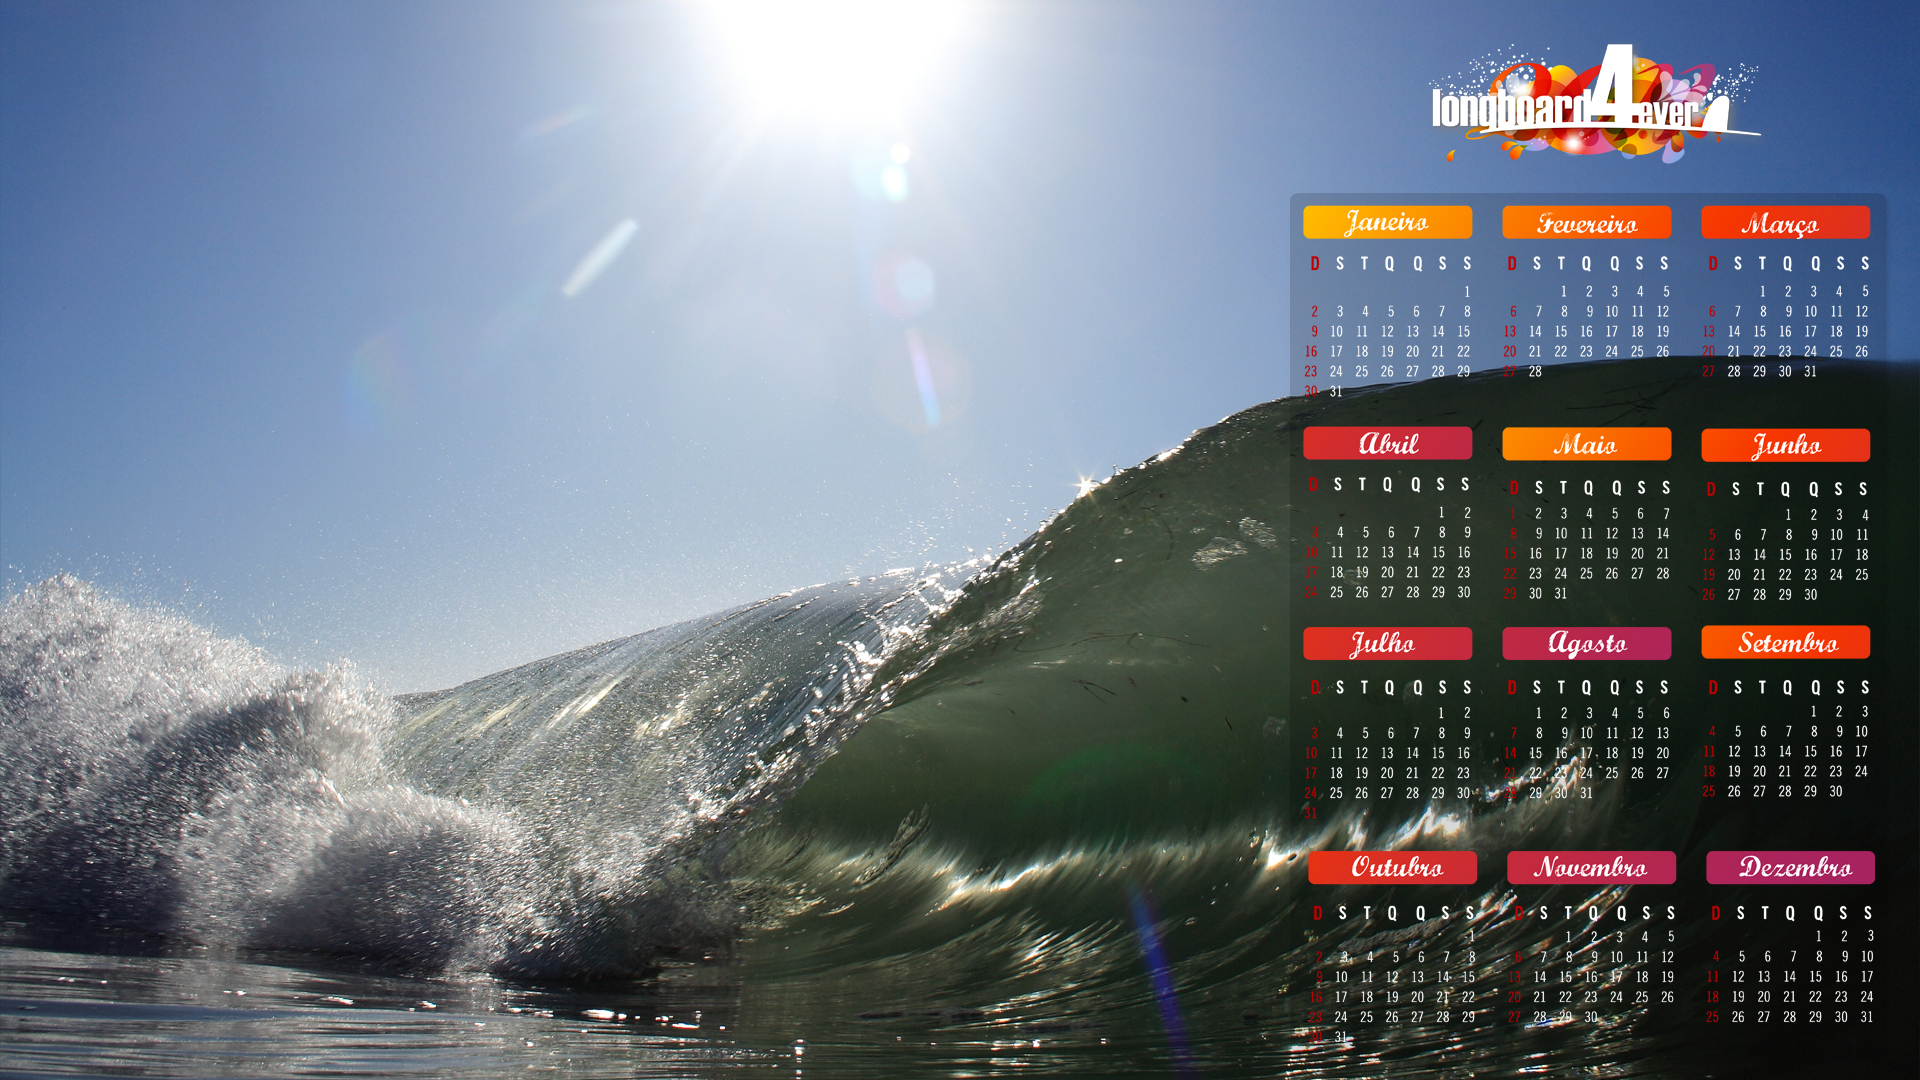 Wallpapers Longboard Bic Surf 1920x1080